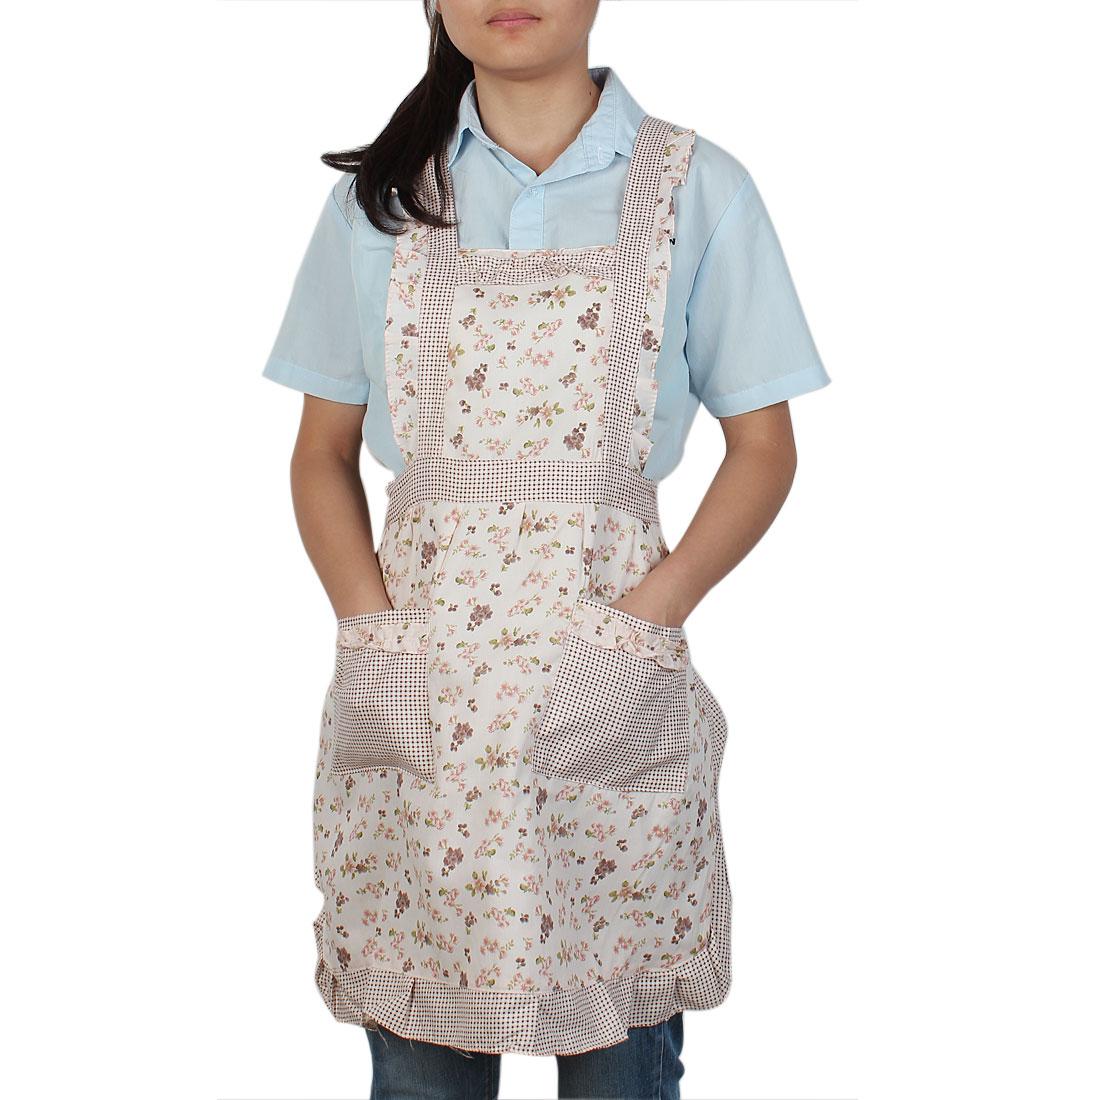 Cook Cooking Pink Flower Pattern 2 Front Pocket Self Tie Bib Aprons 83cm Length